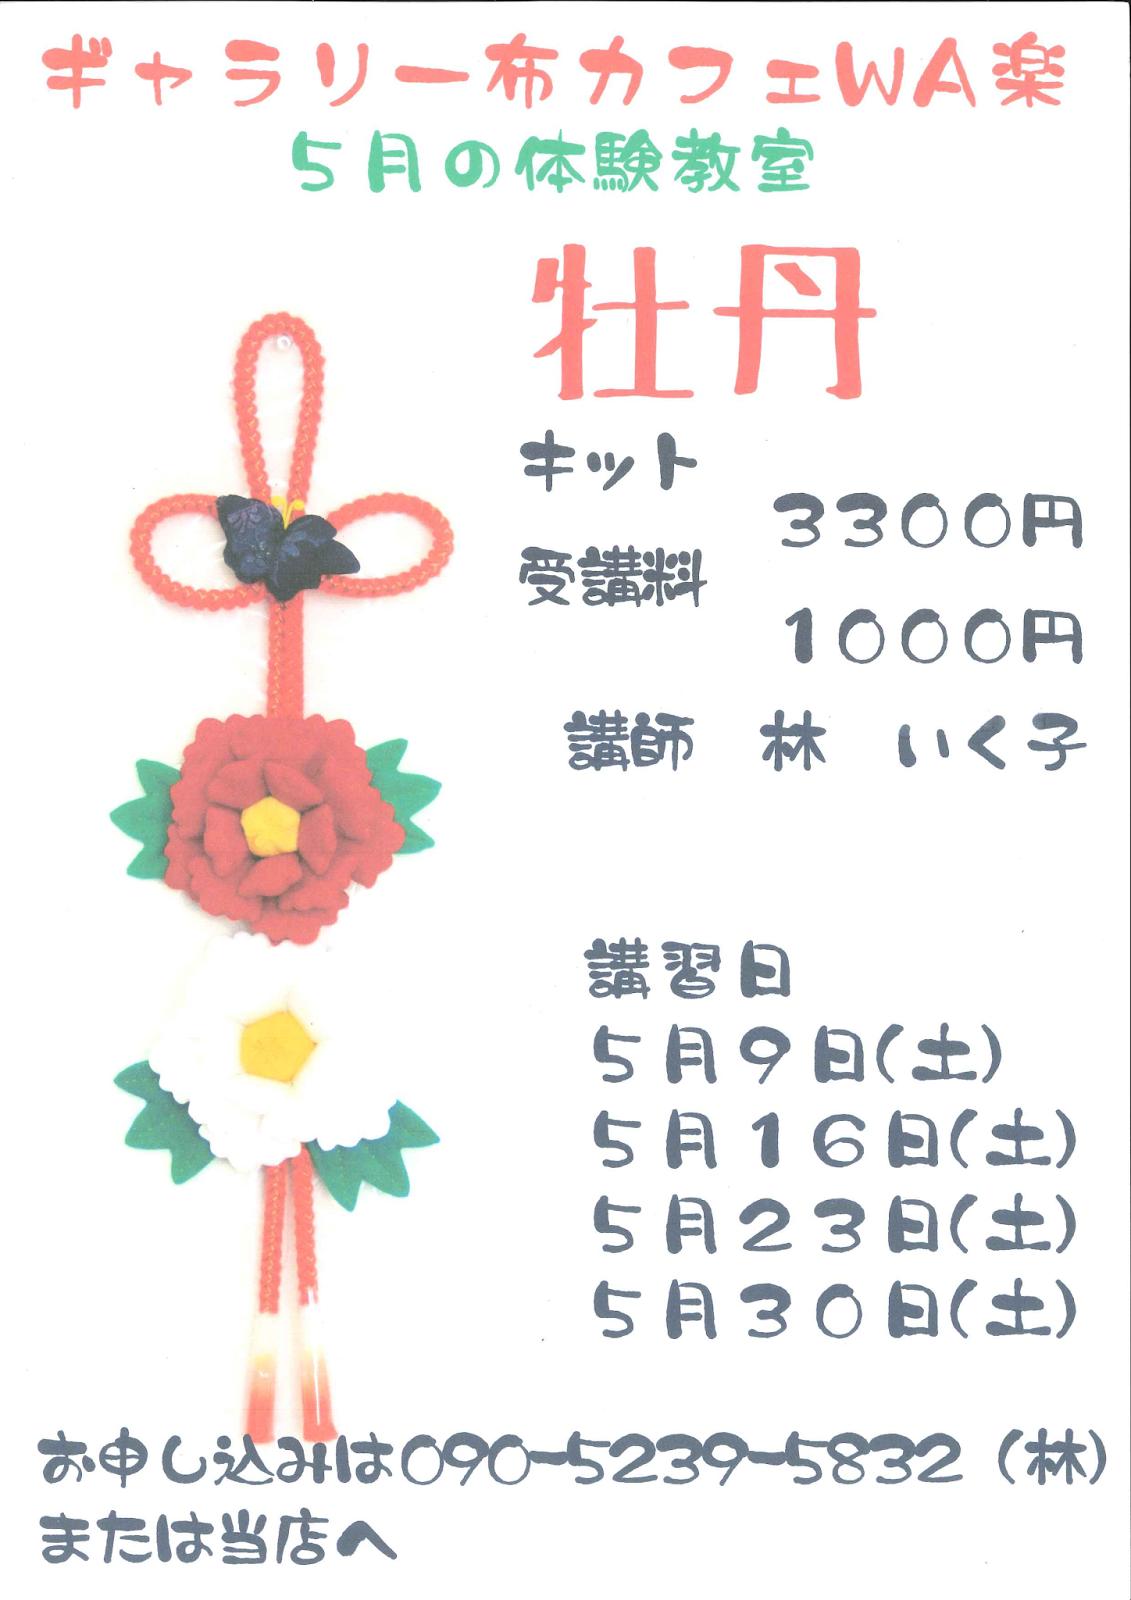 Towada Gallery & Cafe WARAKU May Handicrafts Trial Class 十和田市 ギャラリー布カフェWA楽 5月体験教室